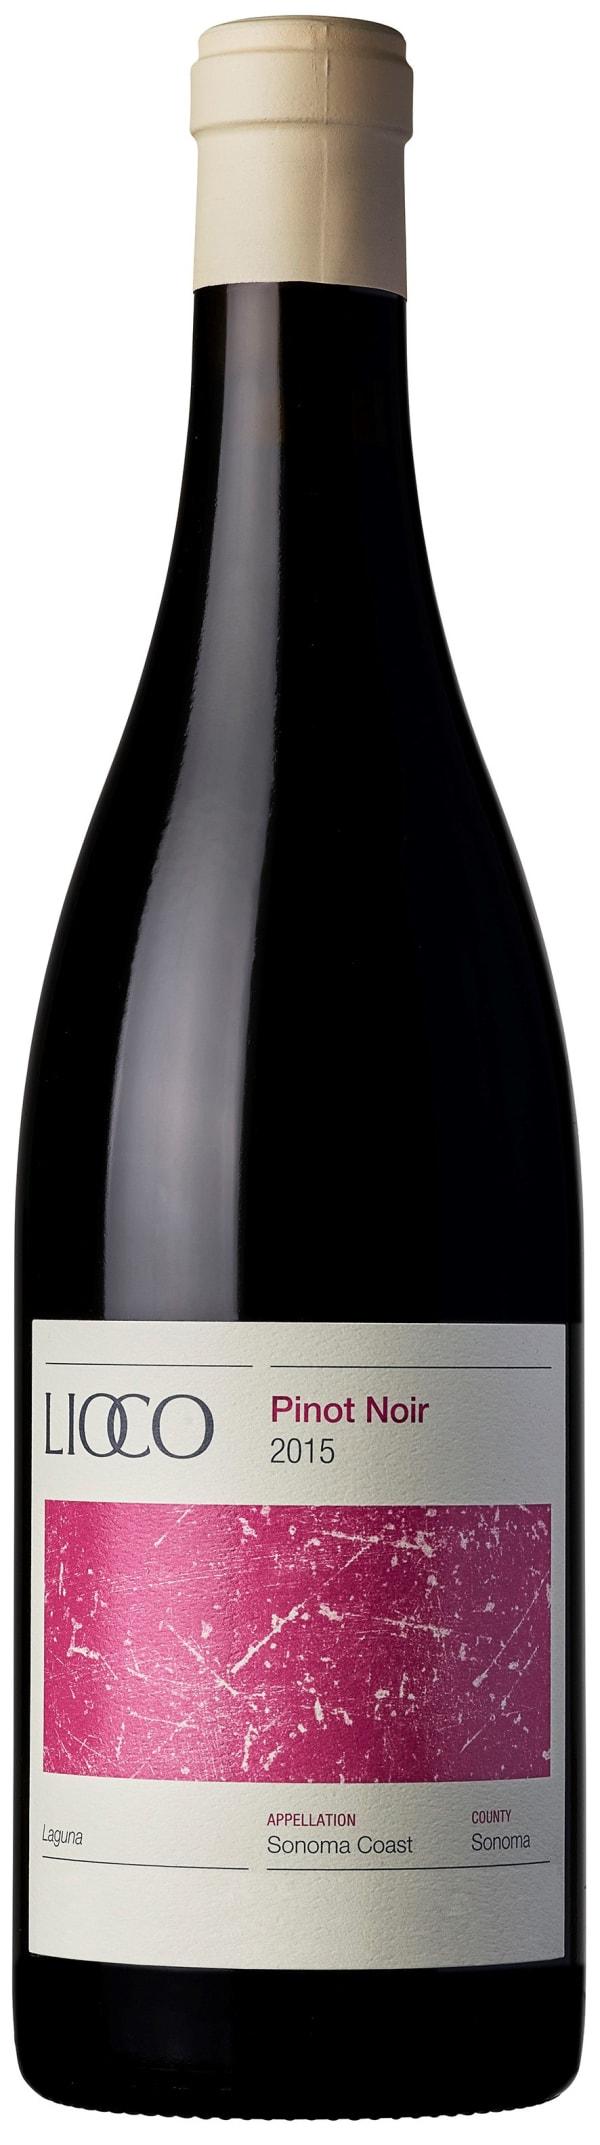 Lioco Laguna Pinot Noir 2015